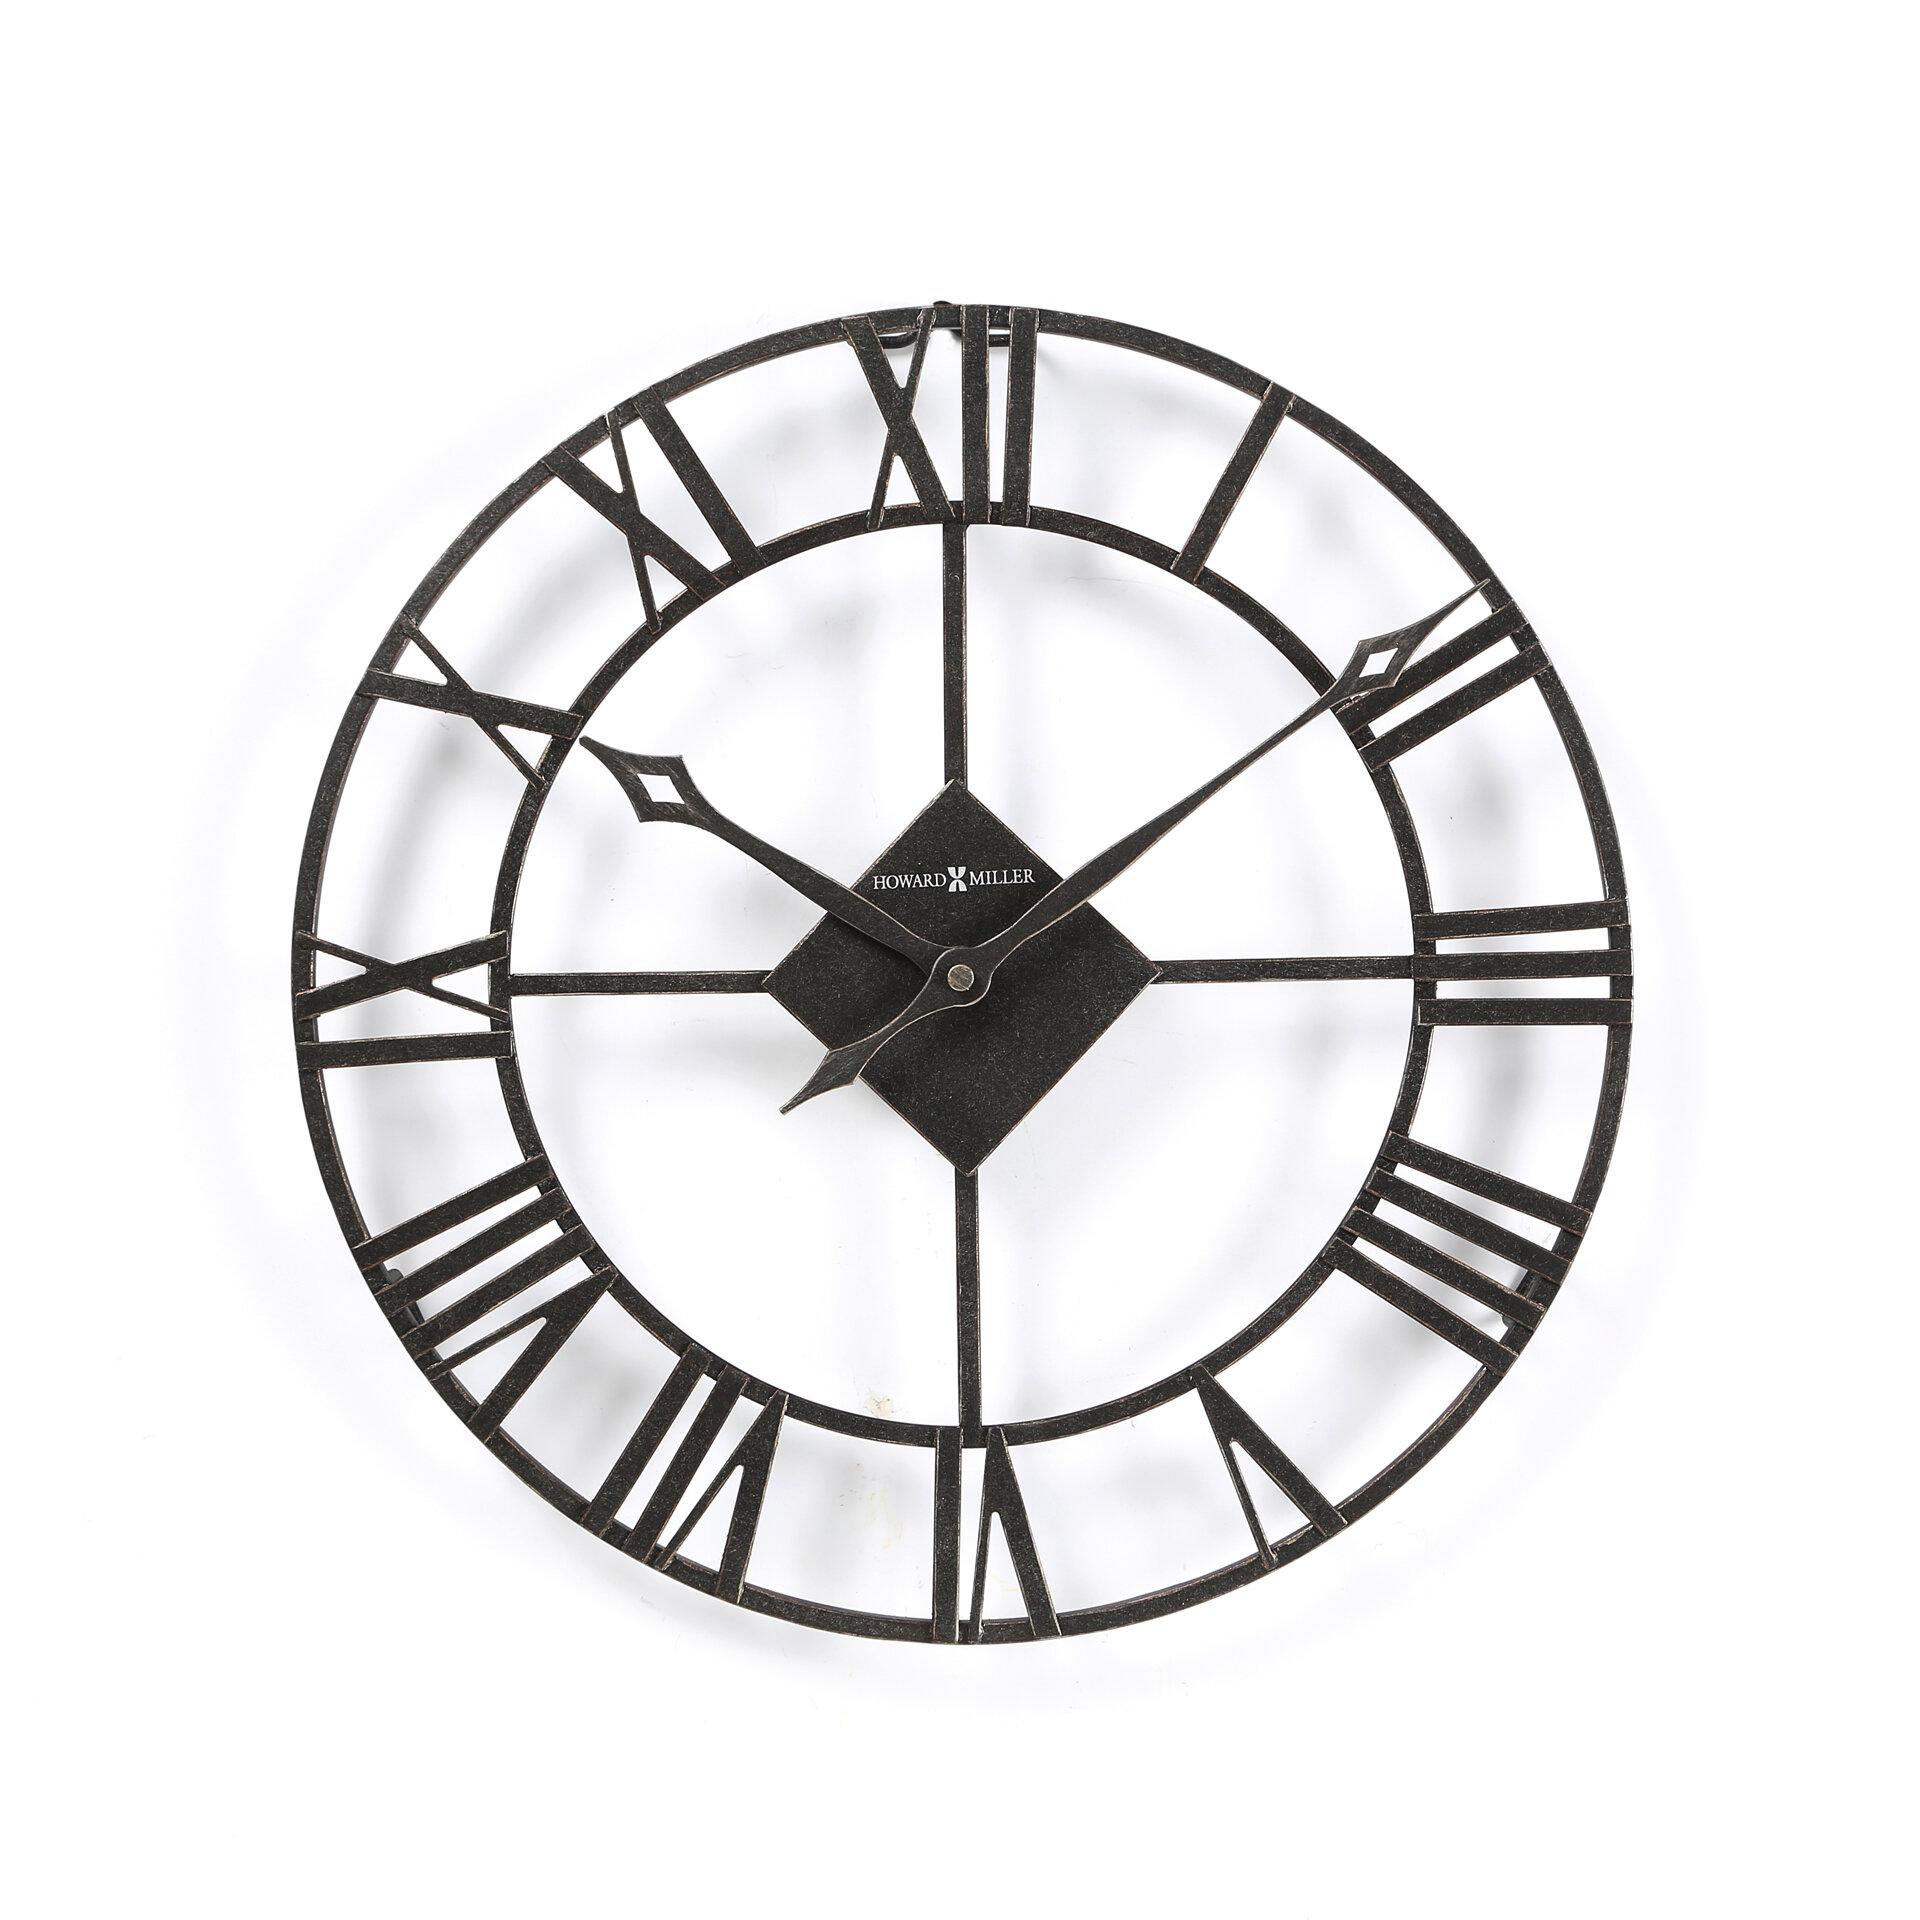 round wrought iron wall clock designer black quartz large